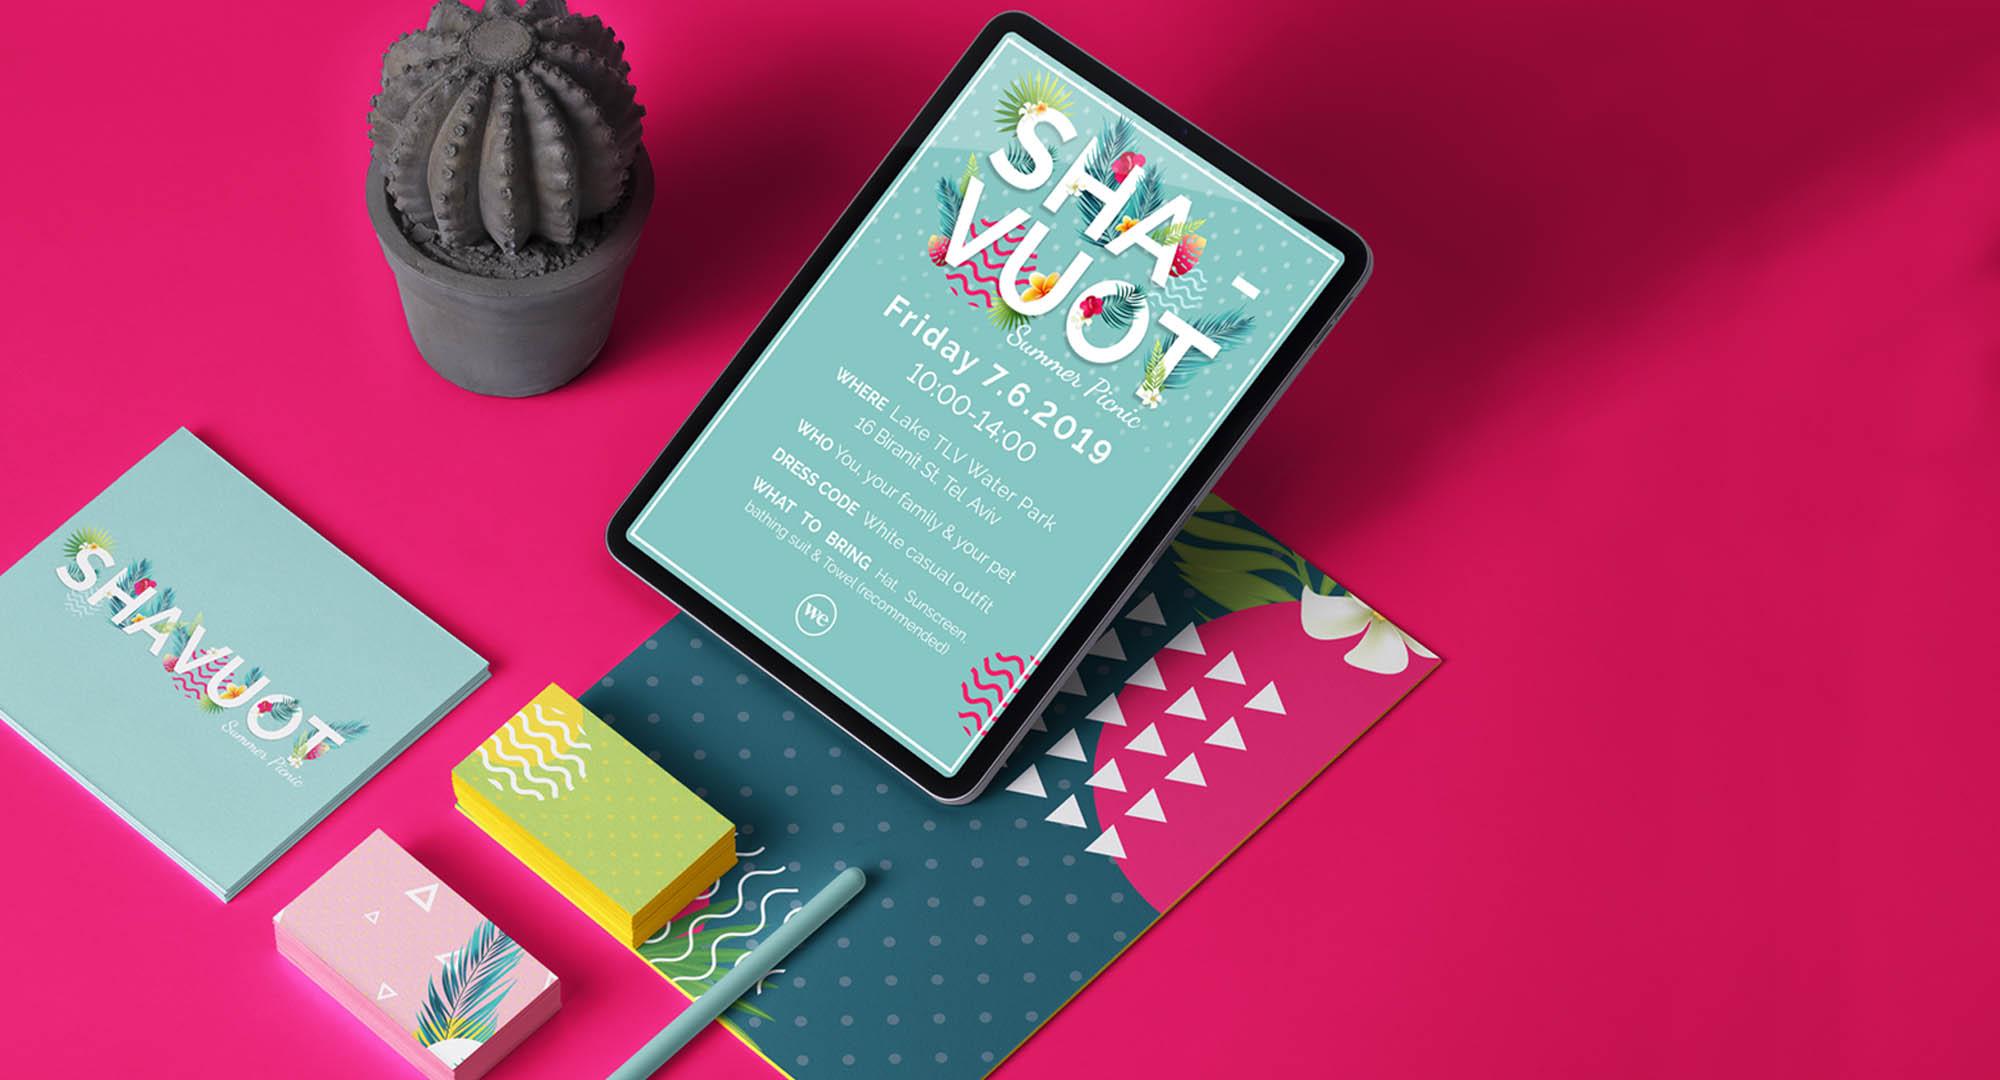 halo-design-shavuot-event-project-001